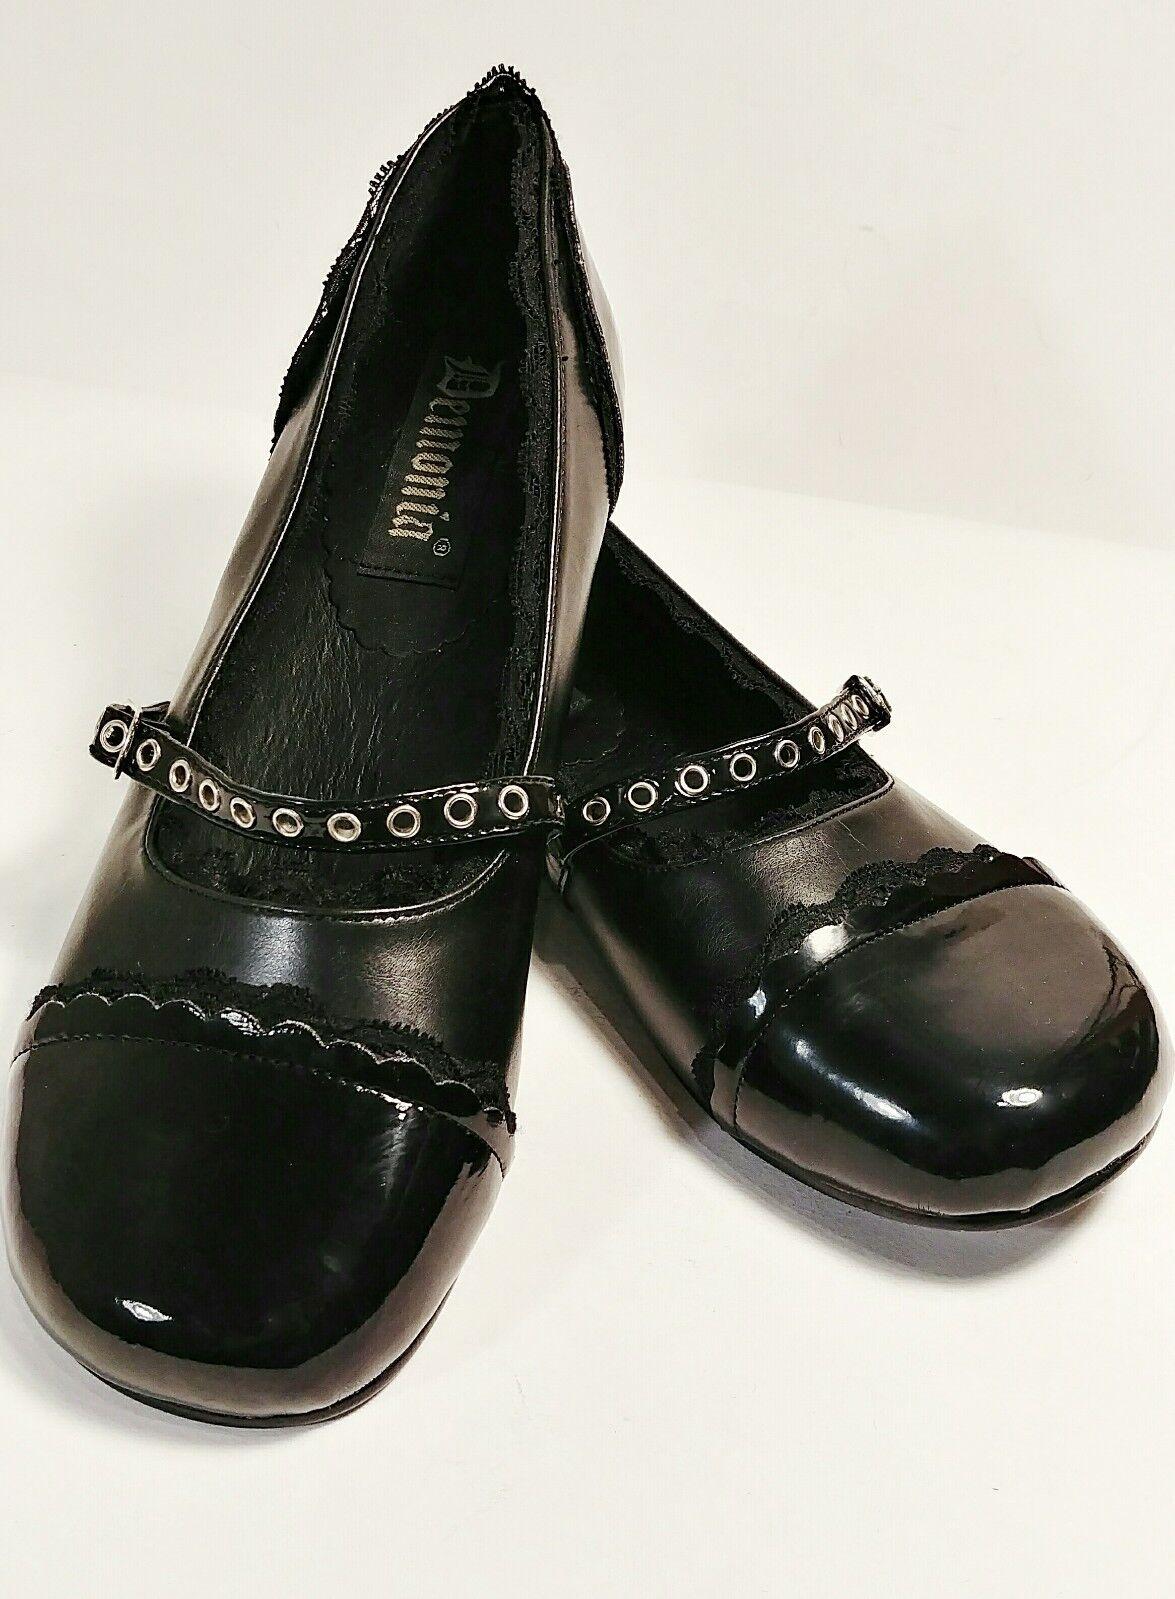 Demonia DAISY-17 Women's Black Vegan Patent Leather Lace Mary Jane Flats Size 8M